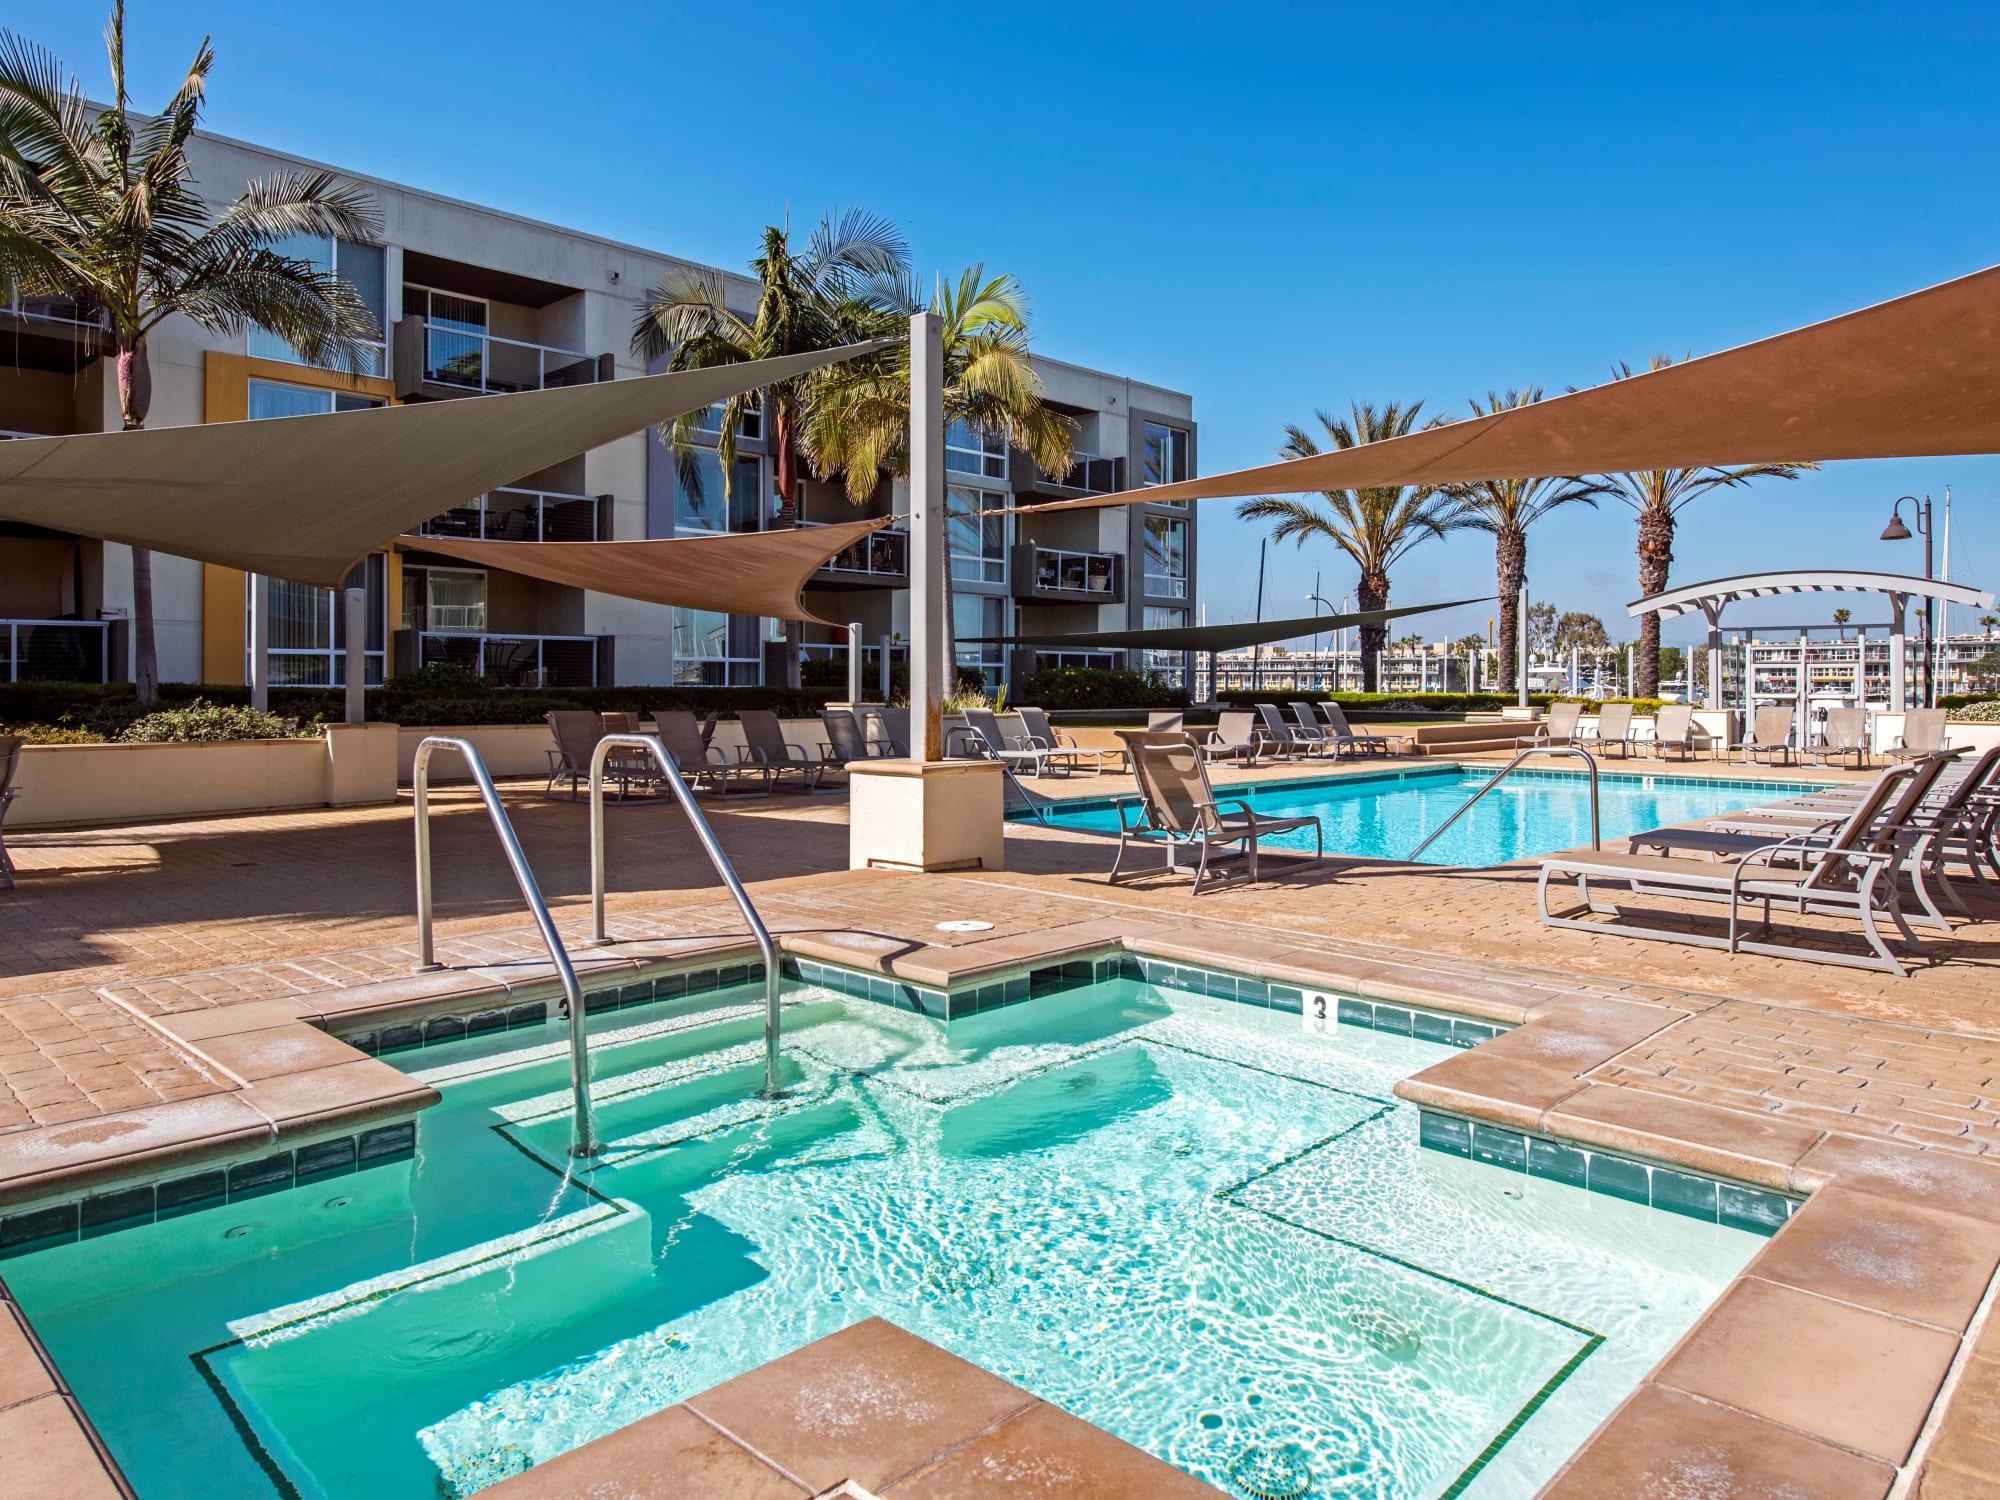 Spa near the swimming pool at The Tides at Marina Harbor in Marina Del Rey, California